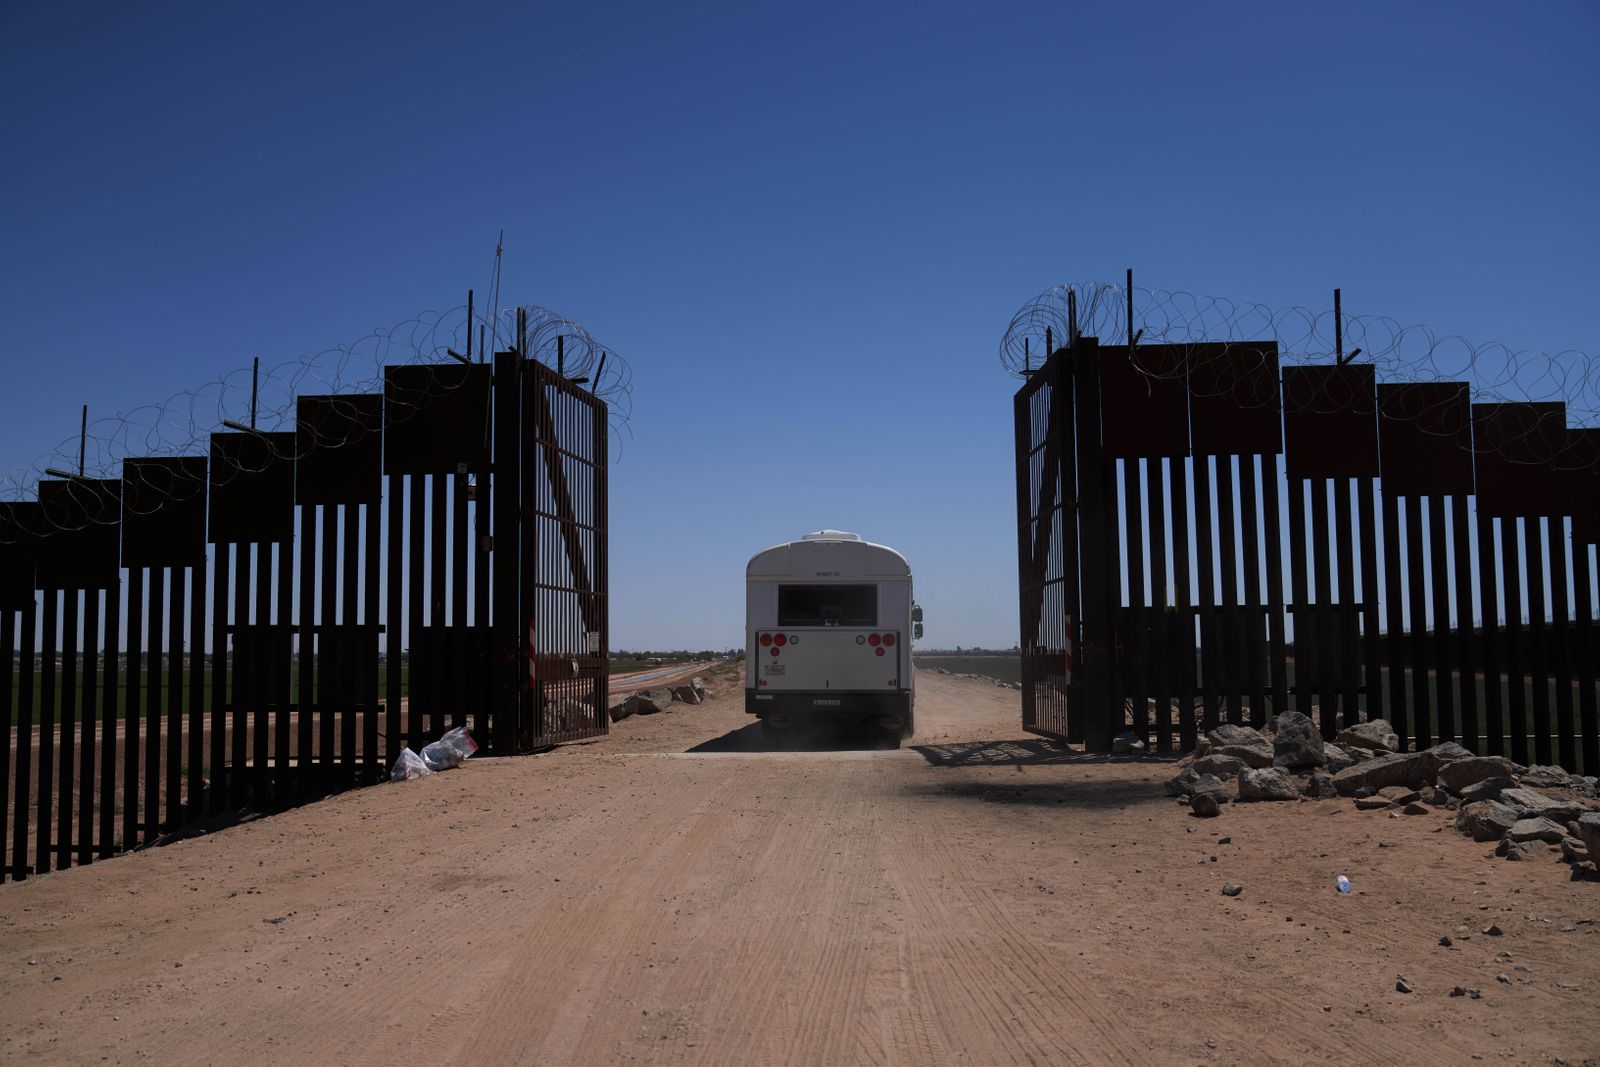 April 23, 2021, Yuma, Arizona, USA: A bus filled with asylum seeking migrants who surrendered to United States Border P